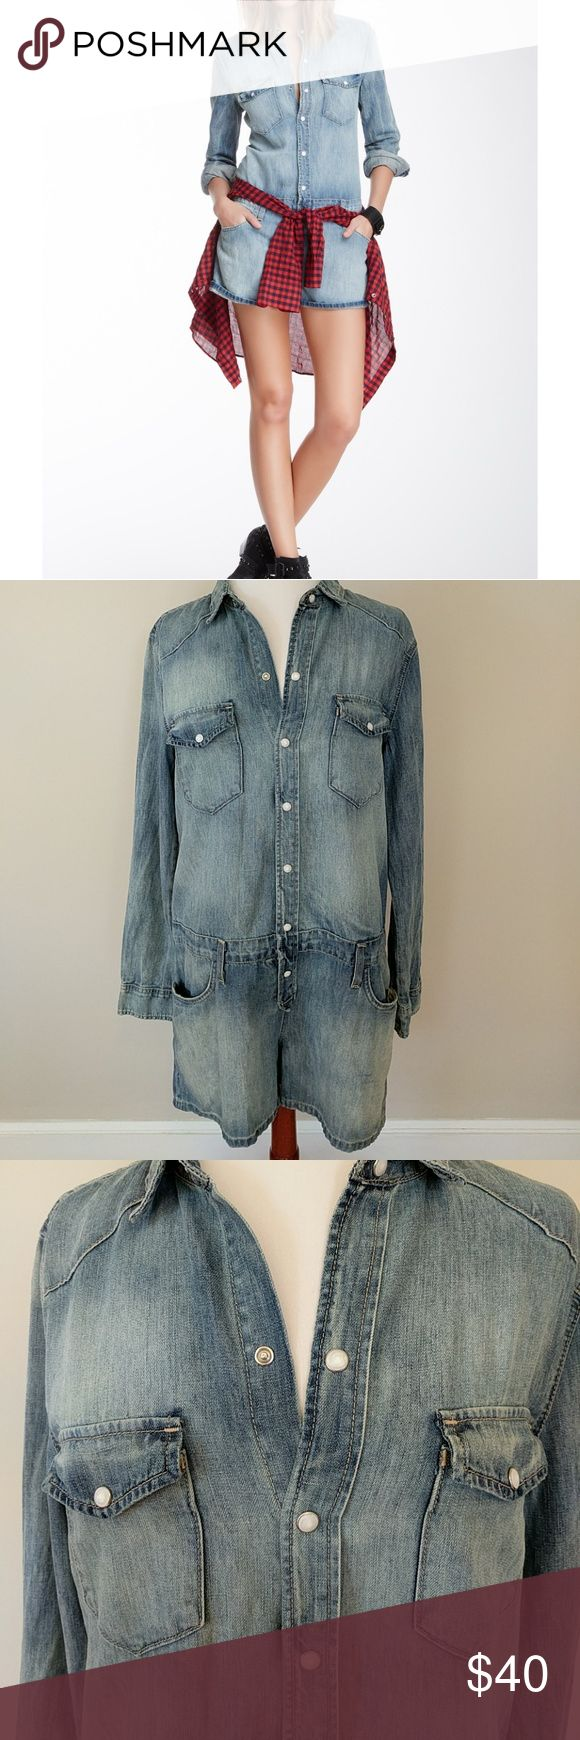 Joe's Denim romper NWT 💥💥1 DAY SALE💥 Blue, denim, snap button down, size 28, NWT Joe's Jeans Jeans